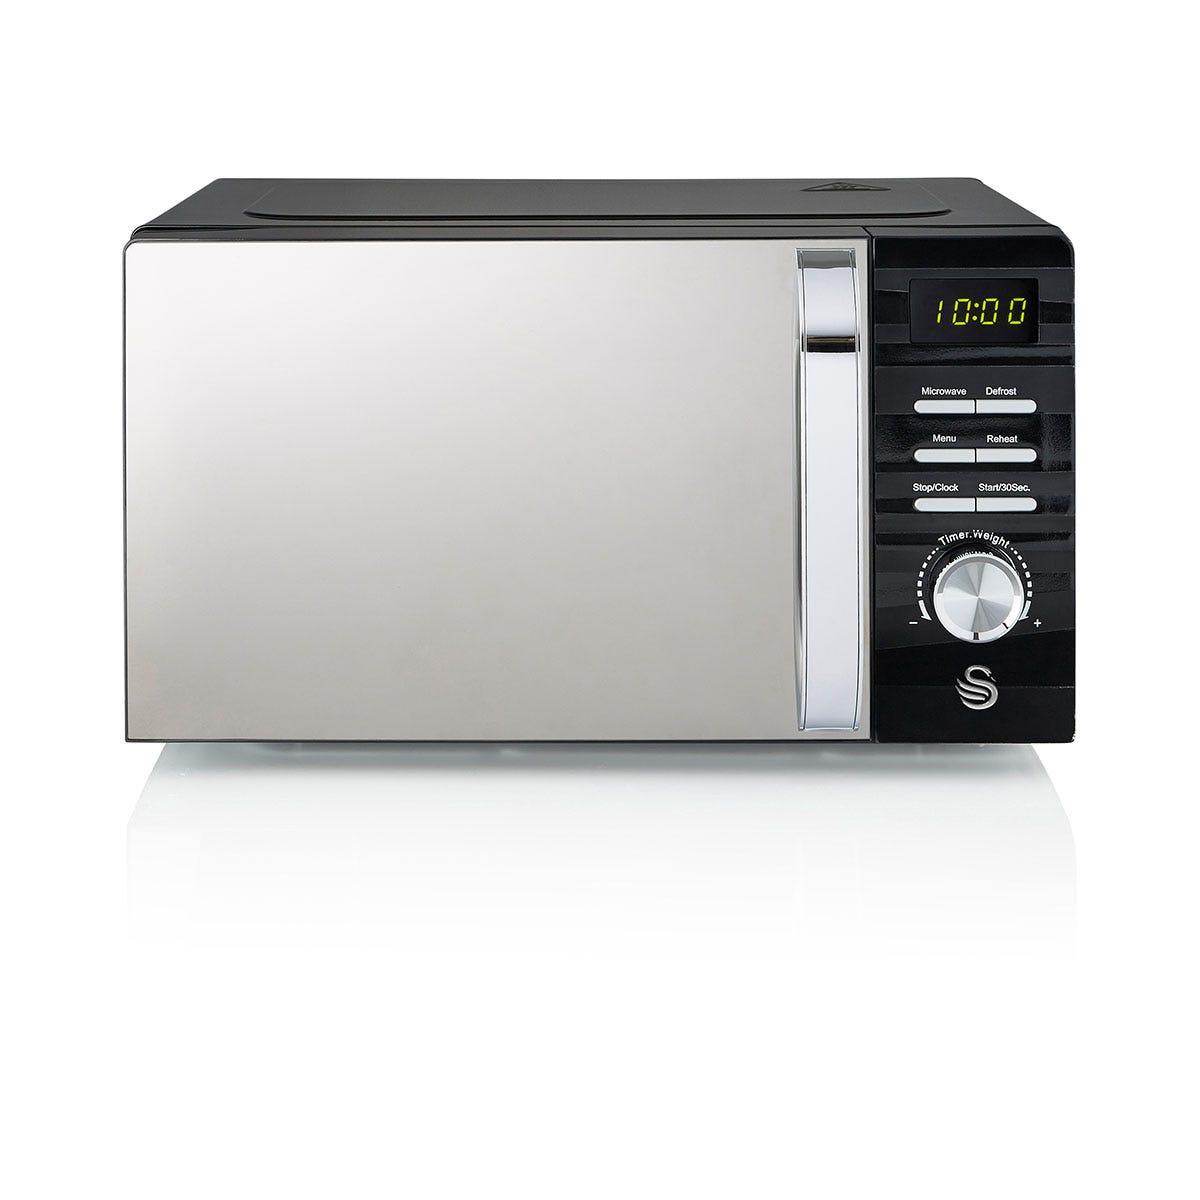 Swan SM22038BN Symphony 700W Digital Microwave - Black